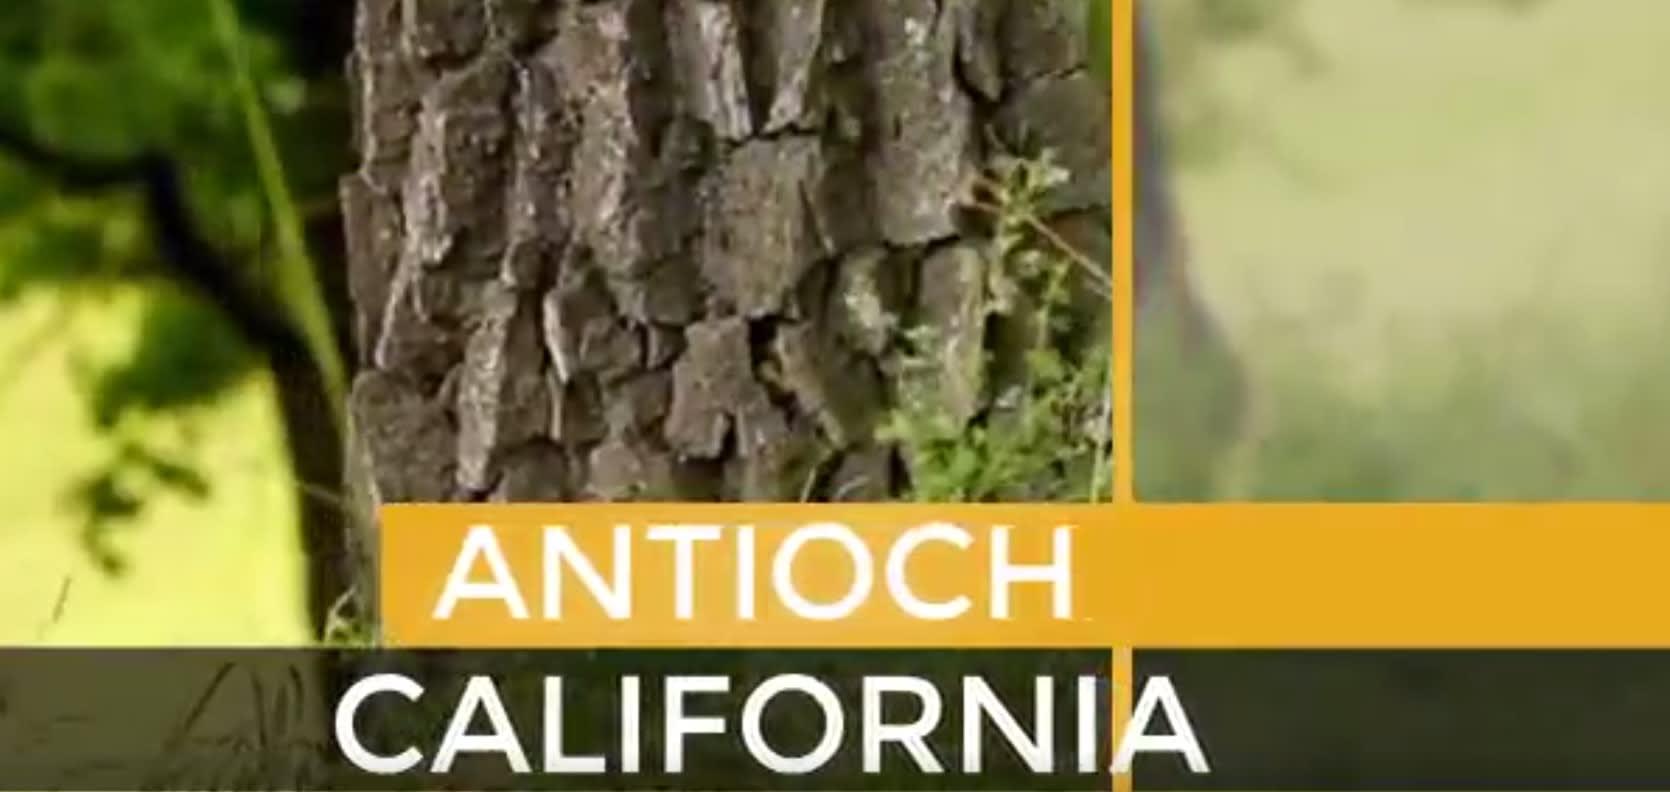 Antioch video preview